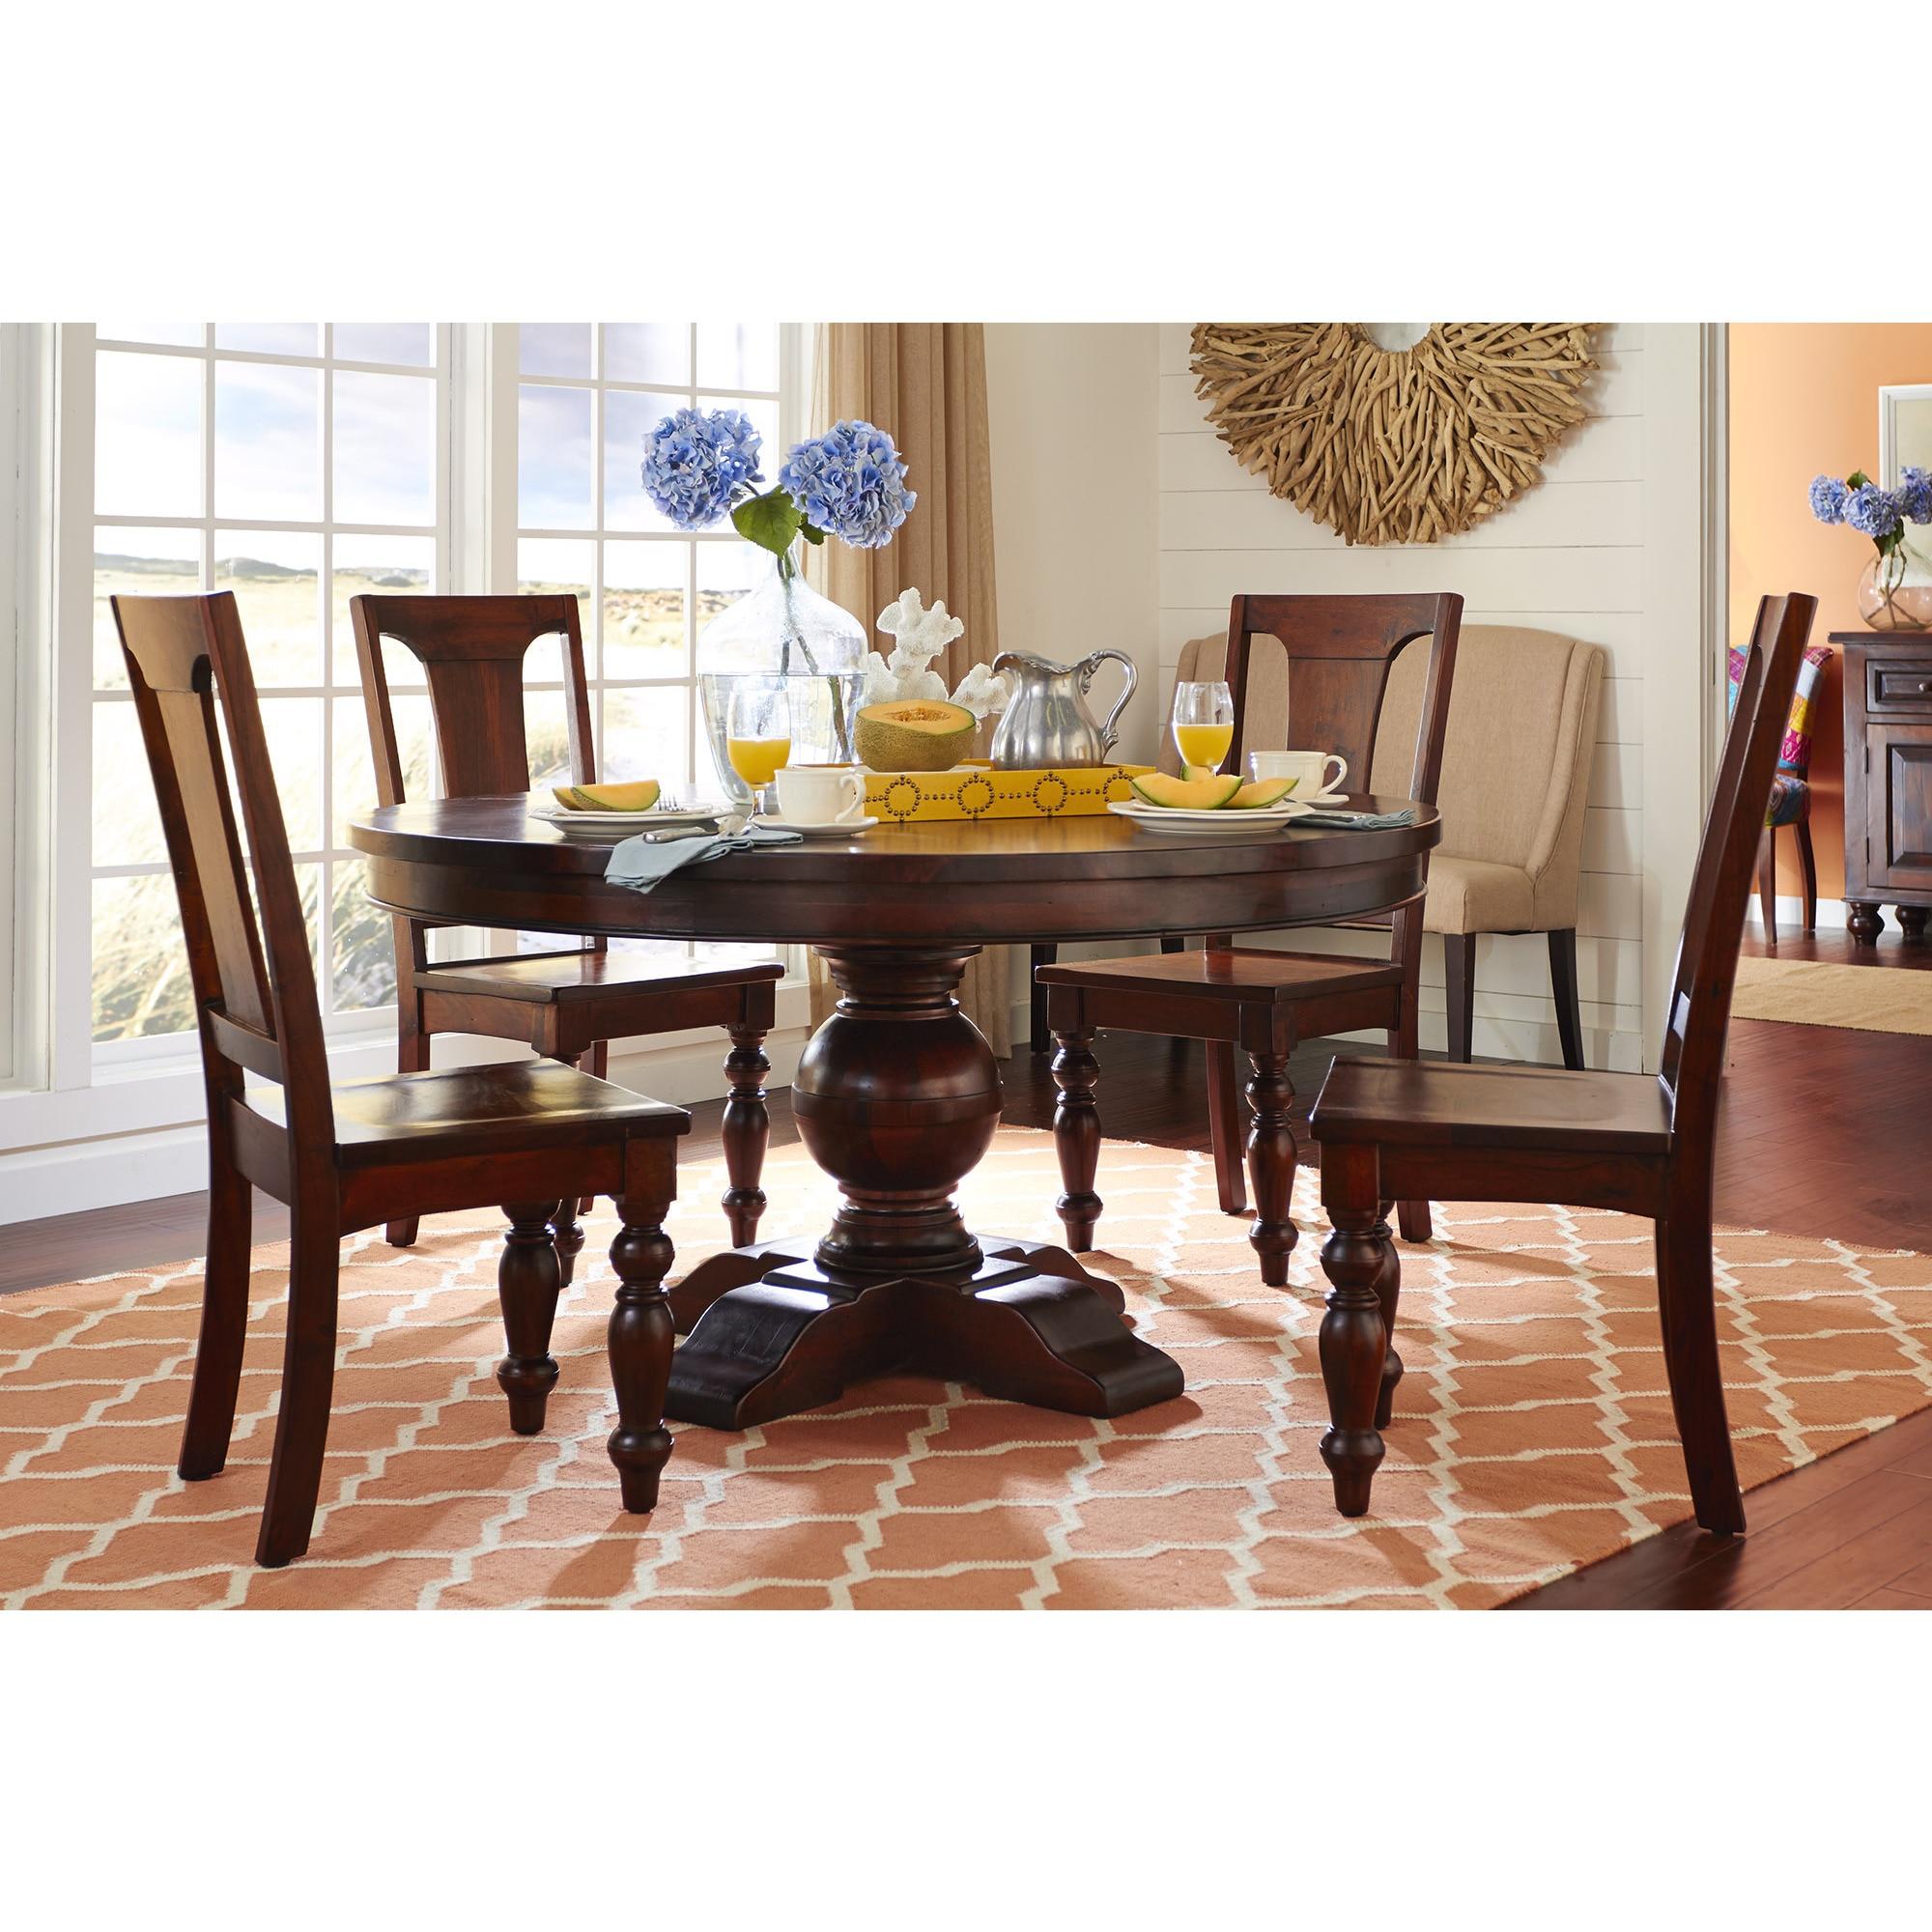 Cool Copper Grove Arneburg Mango Wood Round Dining Table Machost Co Dining Chair Design Ideas Machostcouk